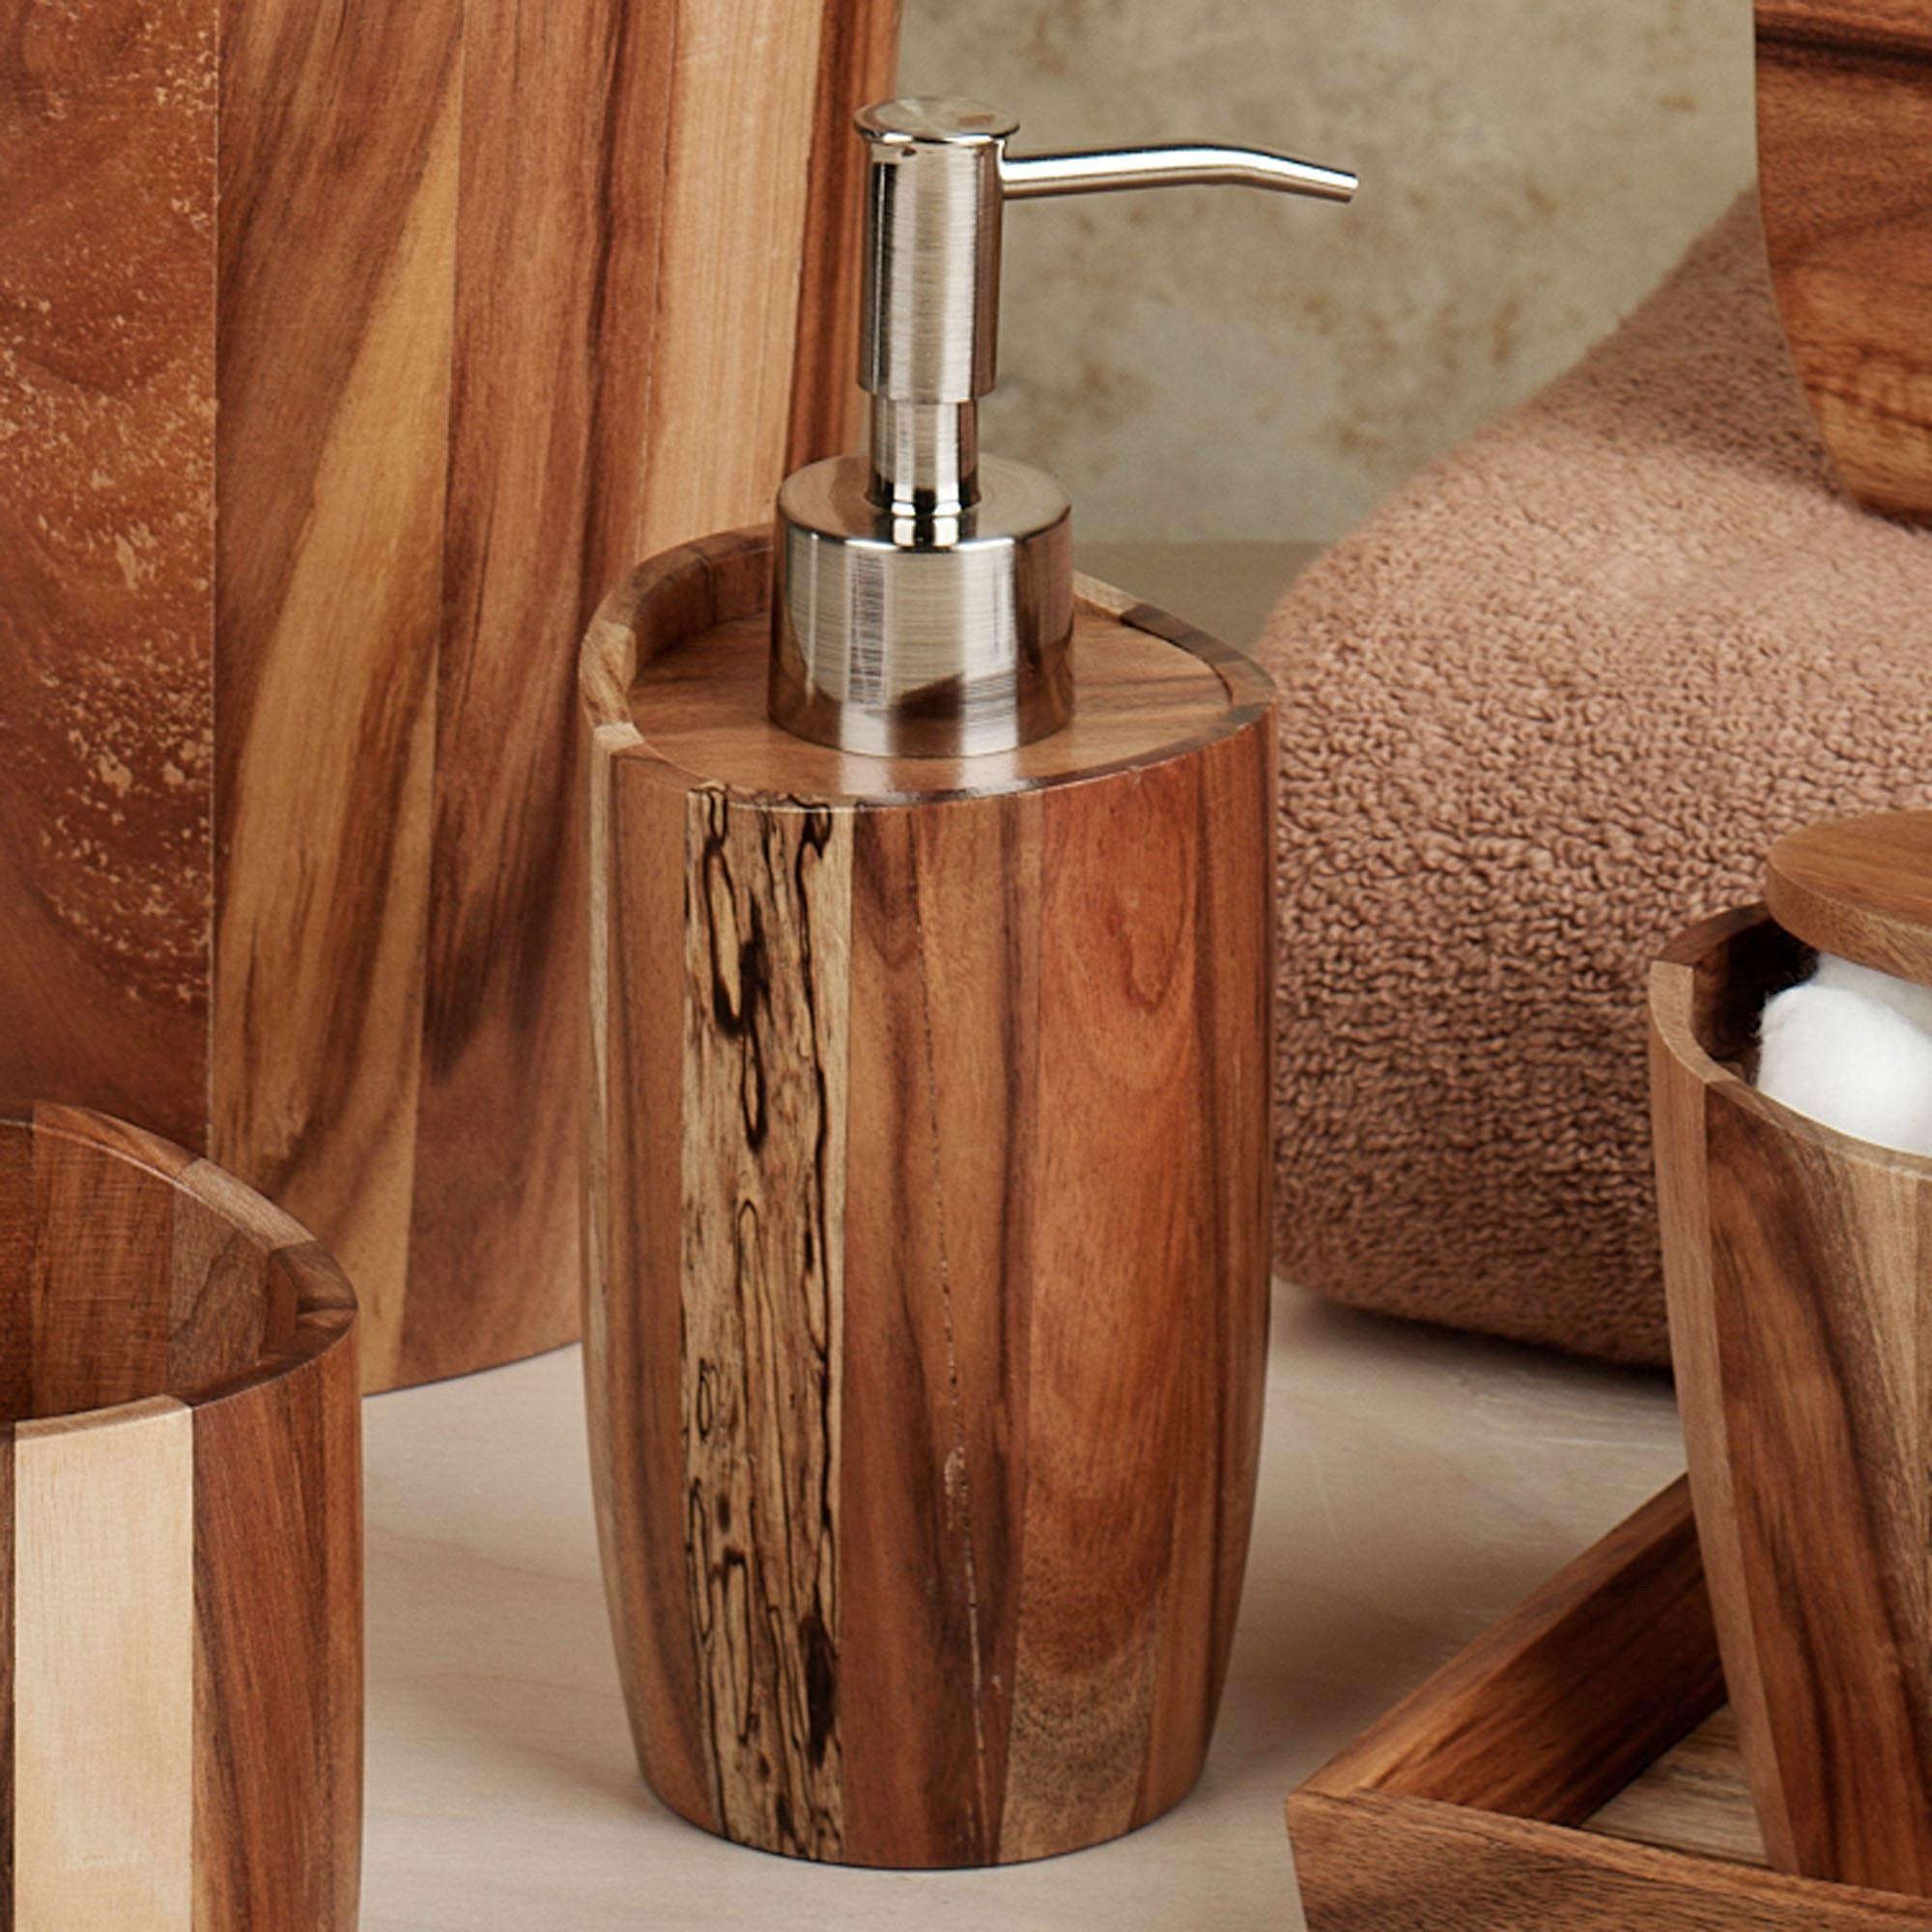 bathroom accessories bath rack wooden | Training4Green.com ...